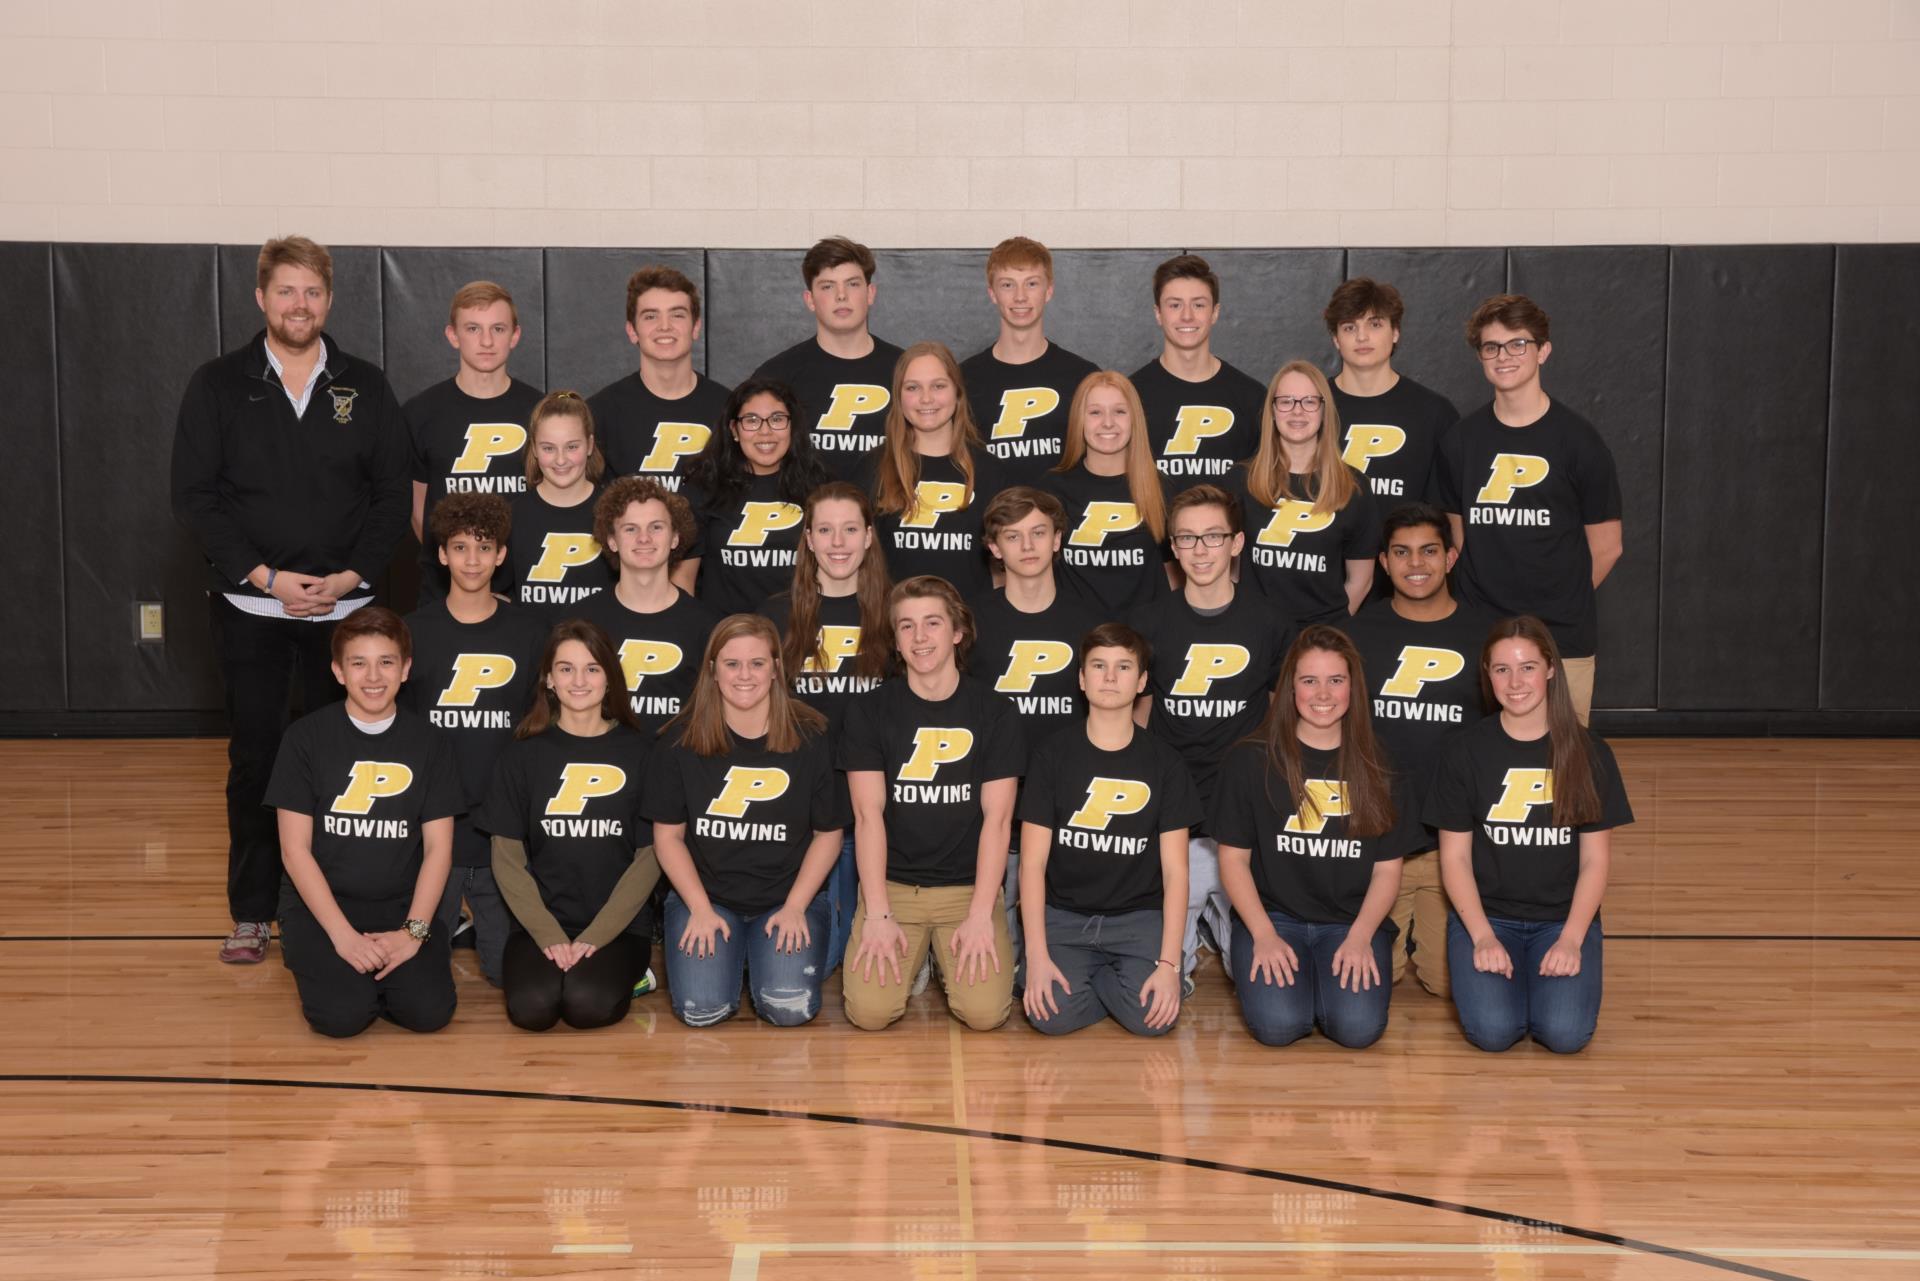 PHS Rowing Team Photo